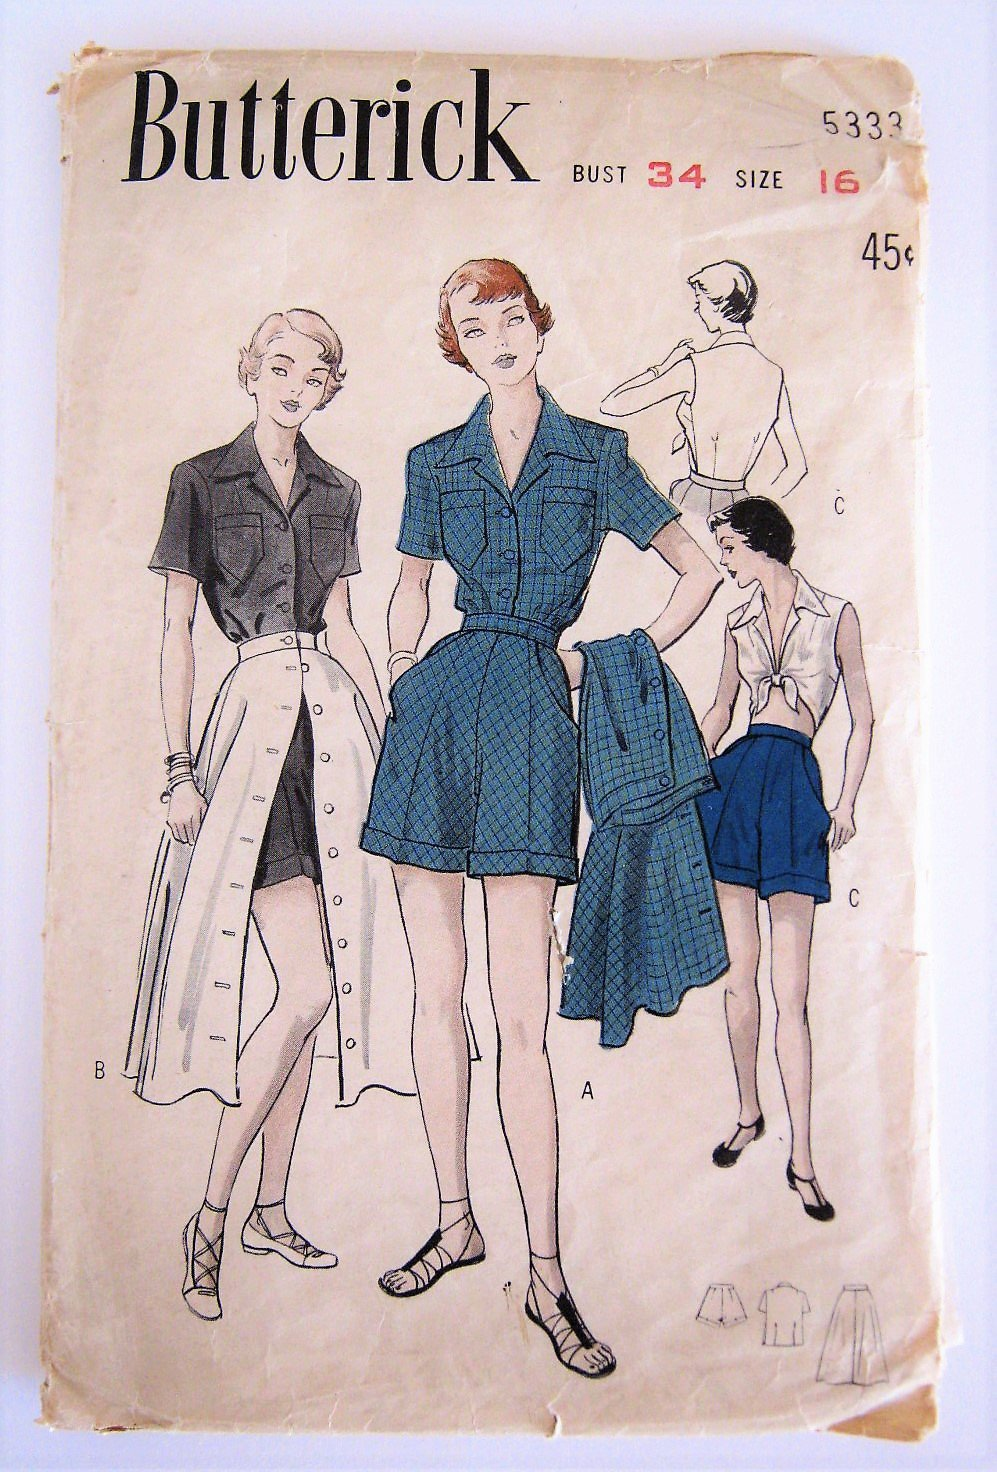 VTG 1950s Playsuit Sewing Pattern 3 Piece Blouse Shorts Skirt Butterick 5333 Bust 34 Size 16